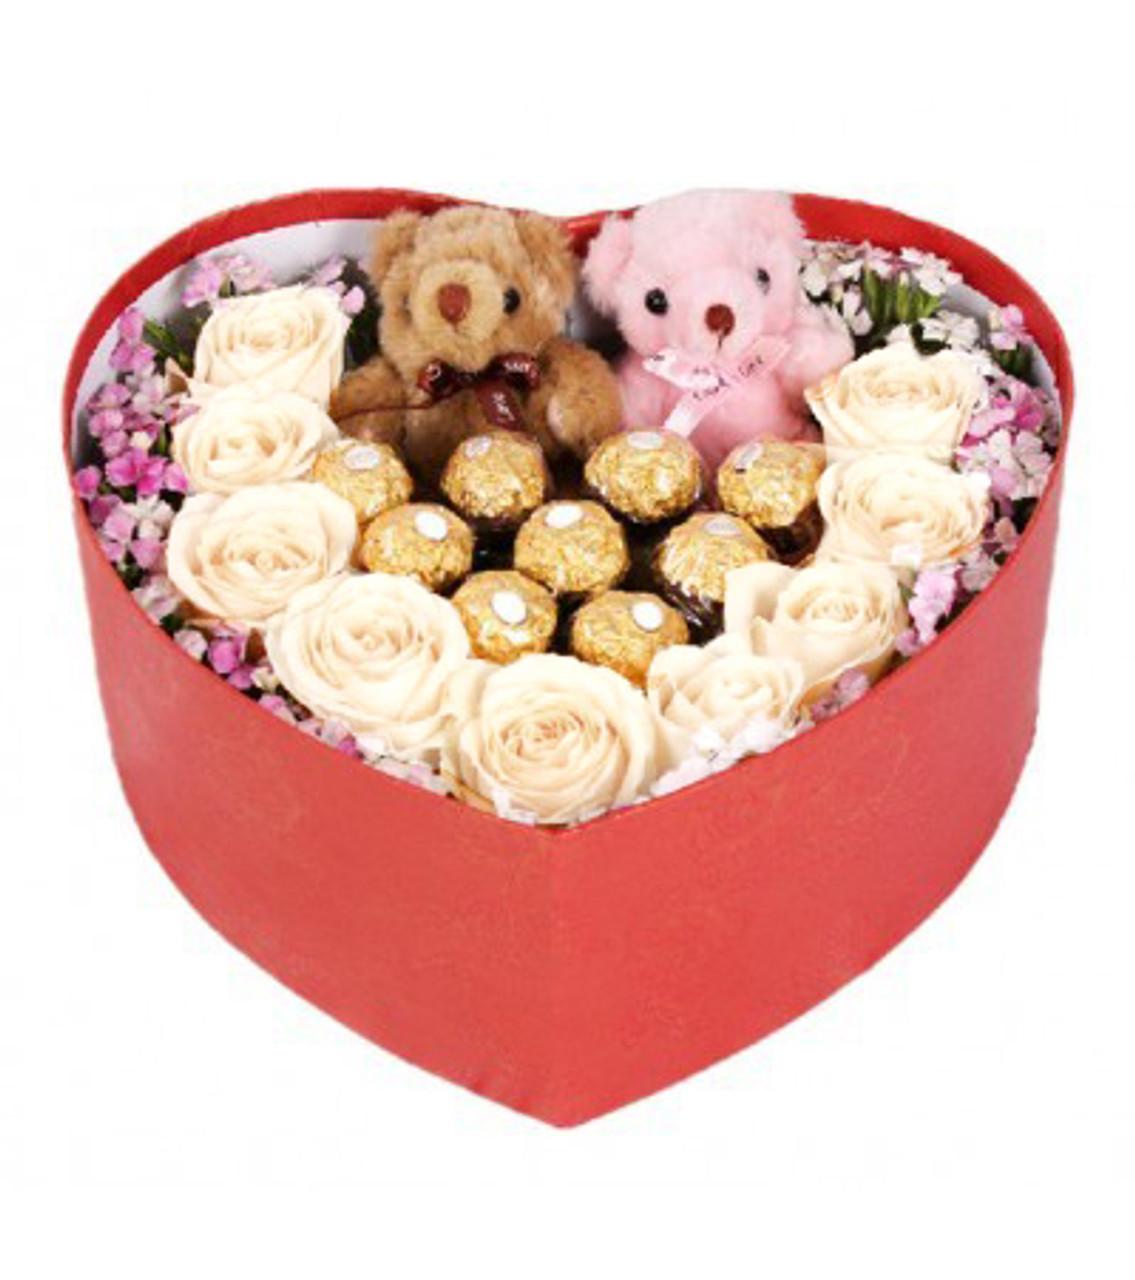 Candy Lovers Heart Box - Best Seller!